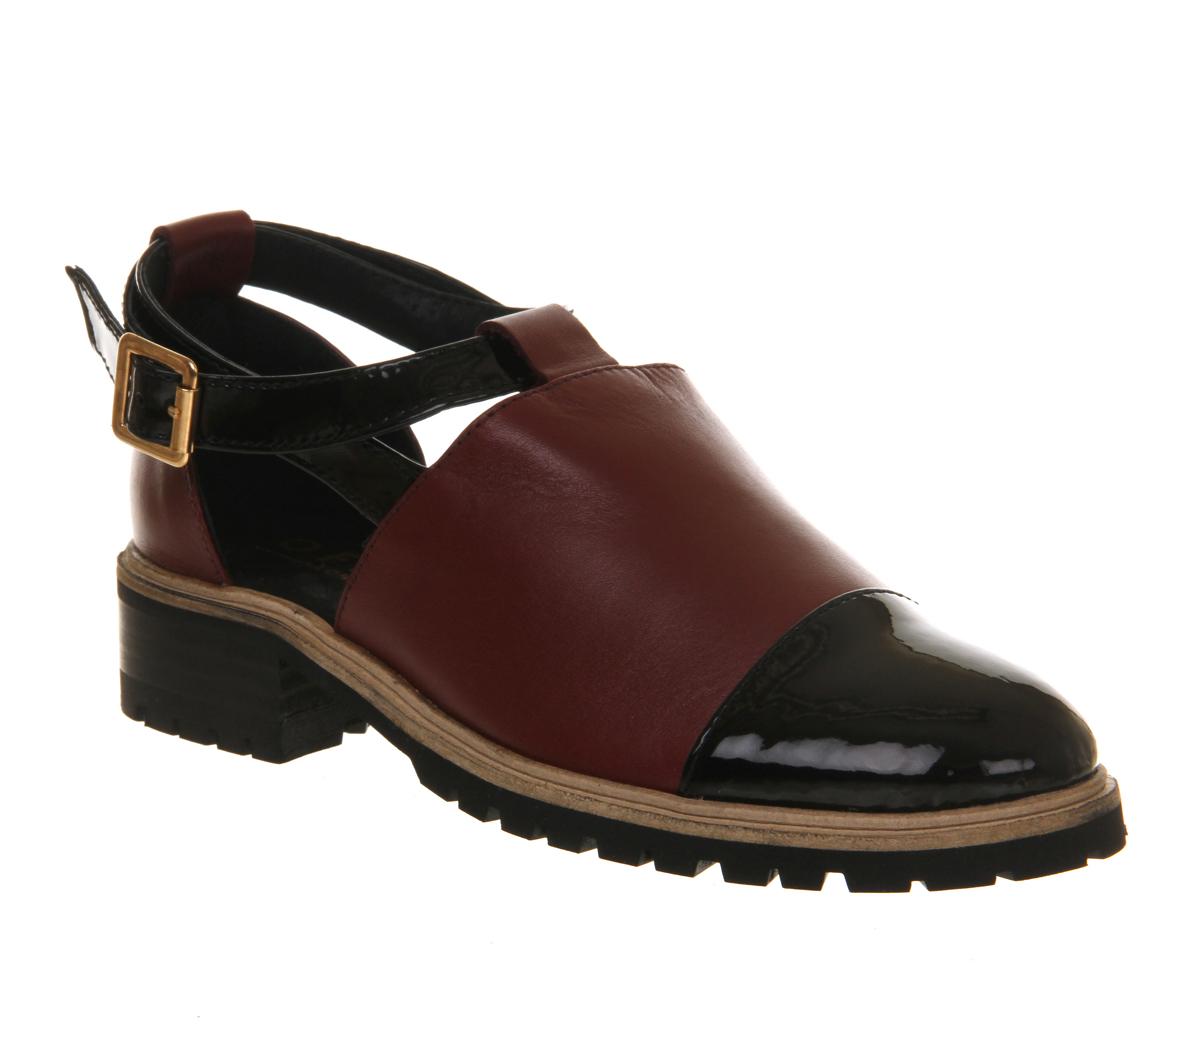 Women's Dr Martens Carrigan Cut-Out Shoe Burgundy Classic Rub Of